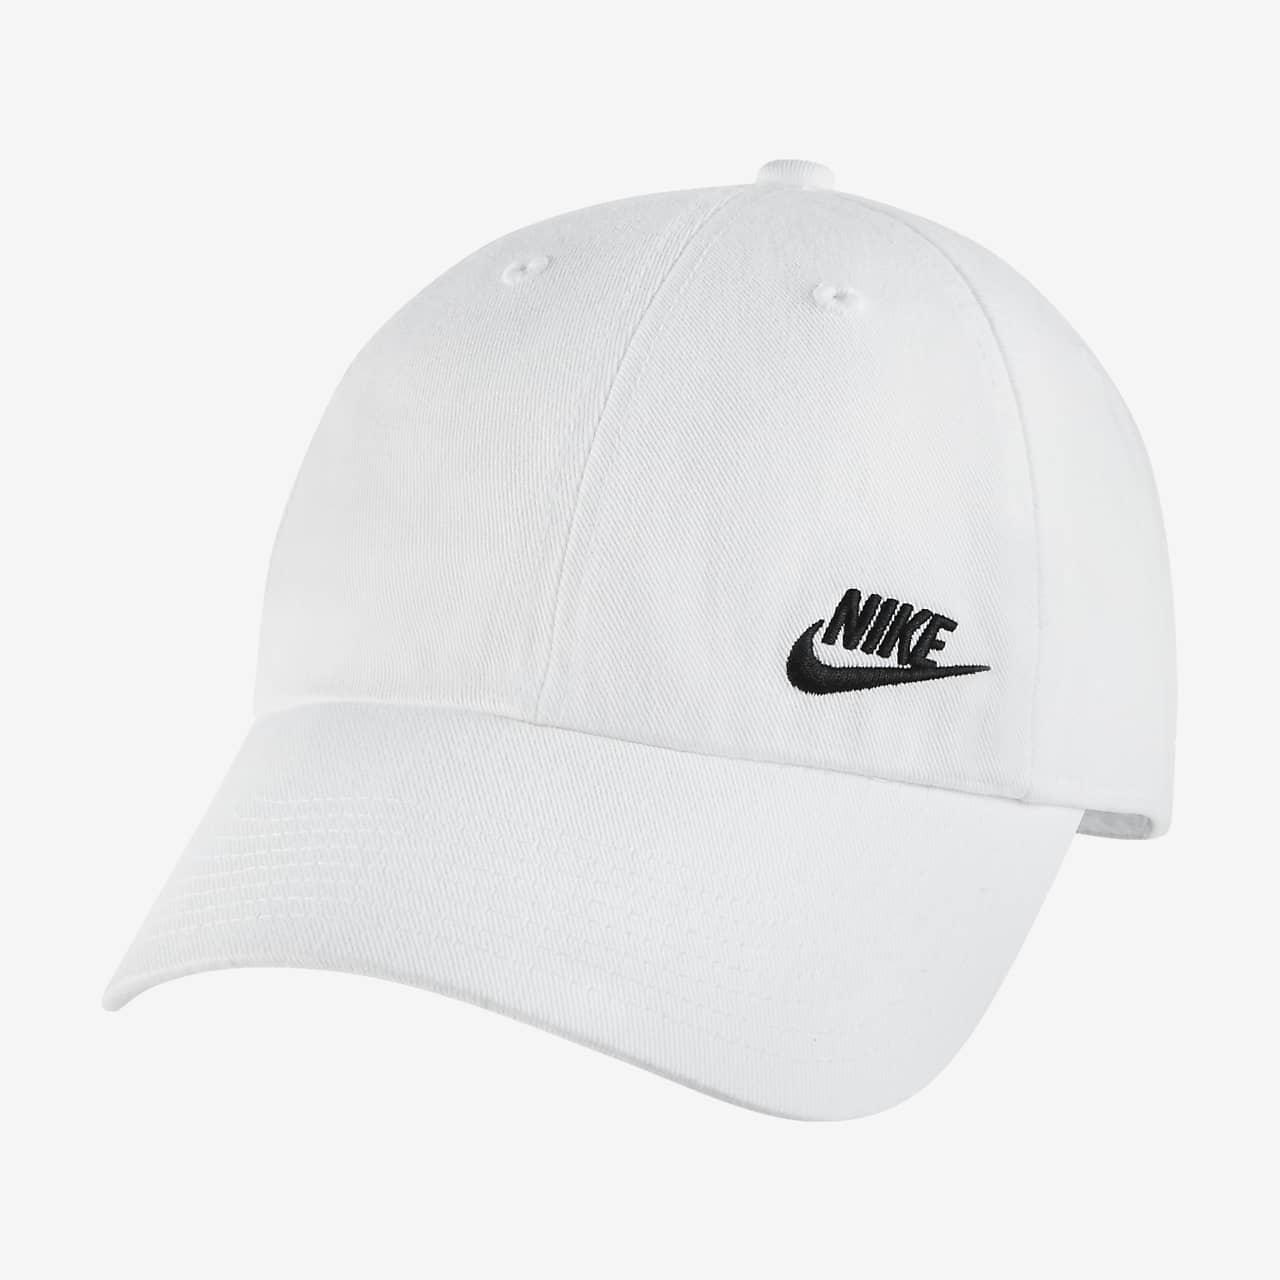 7dcf16afbcd Nike Sportswear Heritage 86 Futura Adjustable Hat. Nike.com IN